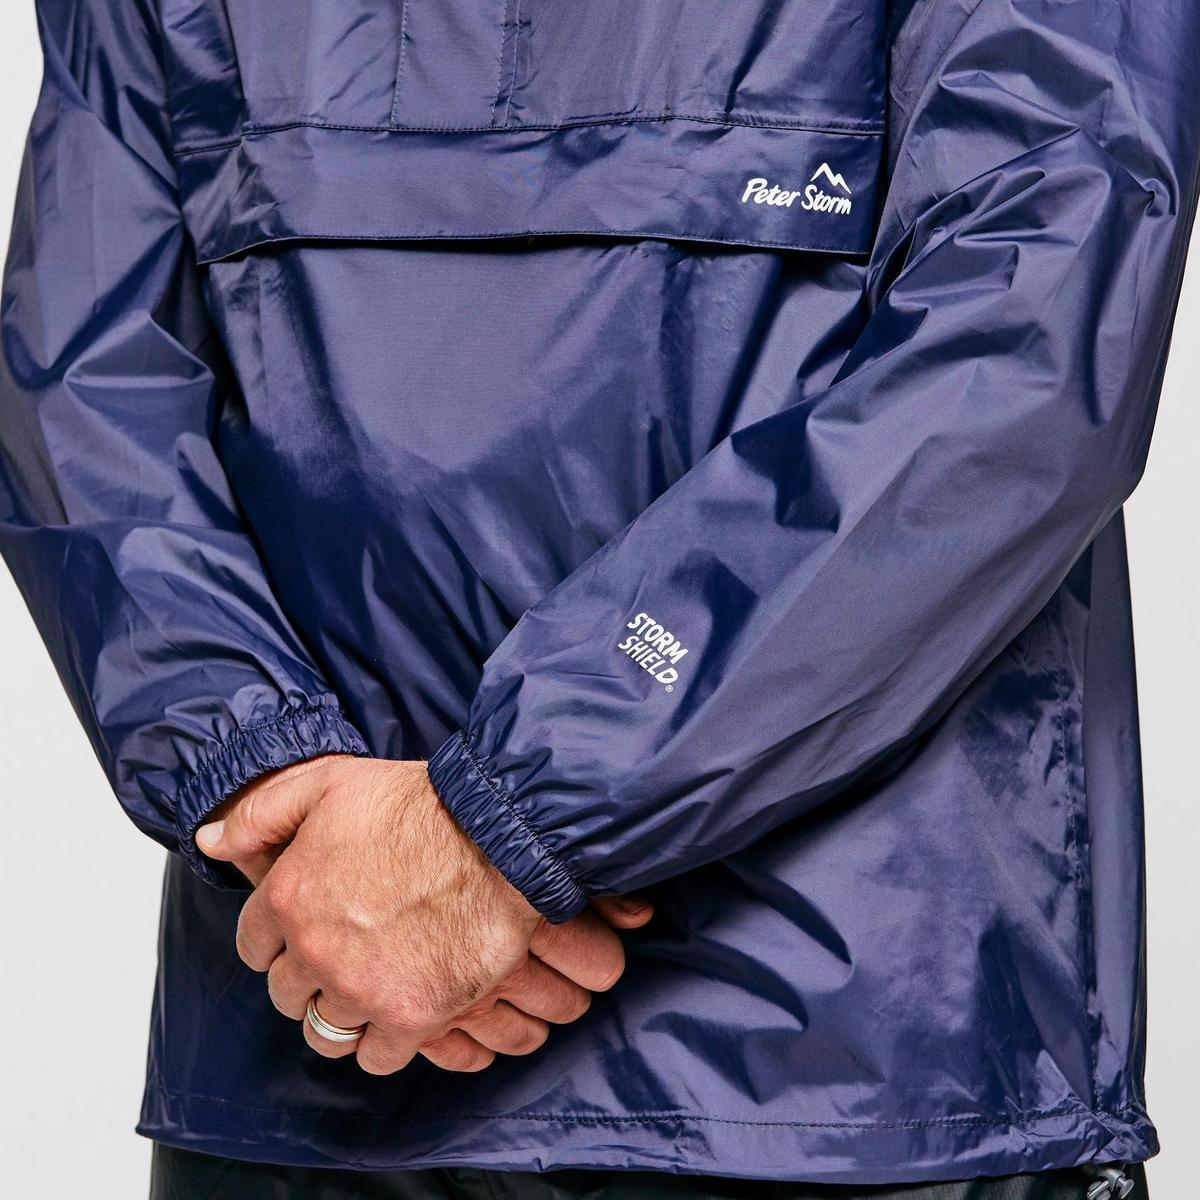 Peter Storm Men's Packable Cagoule - Navy